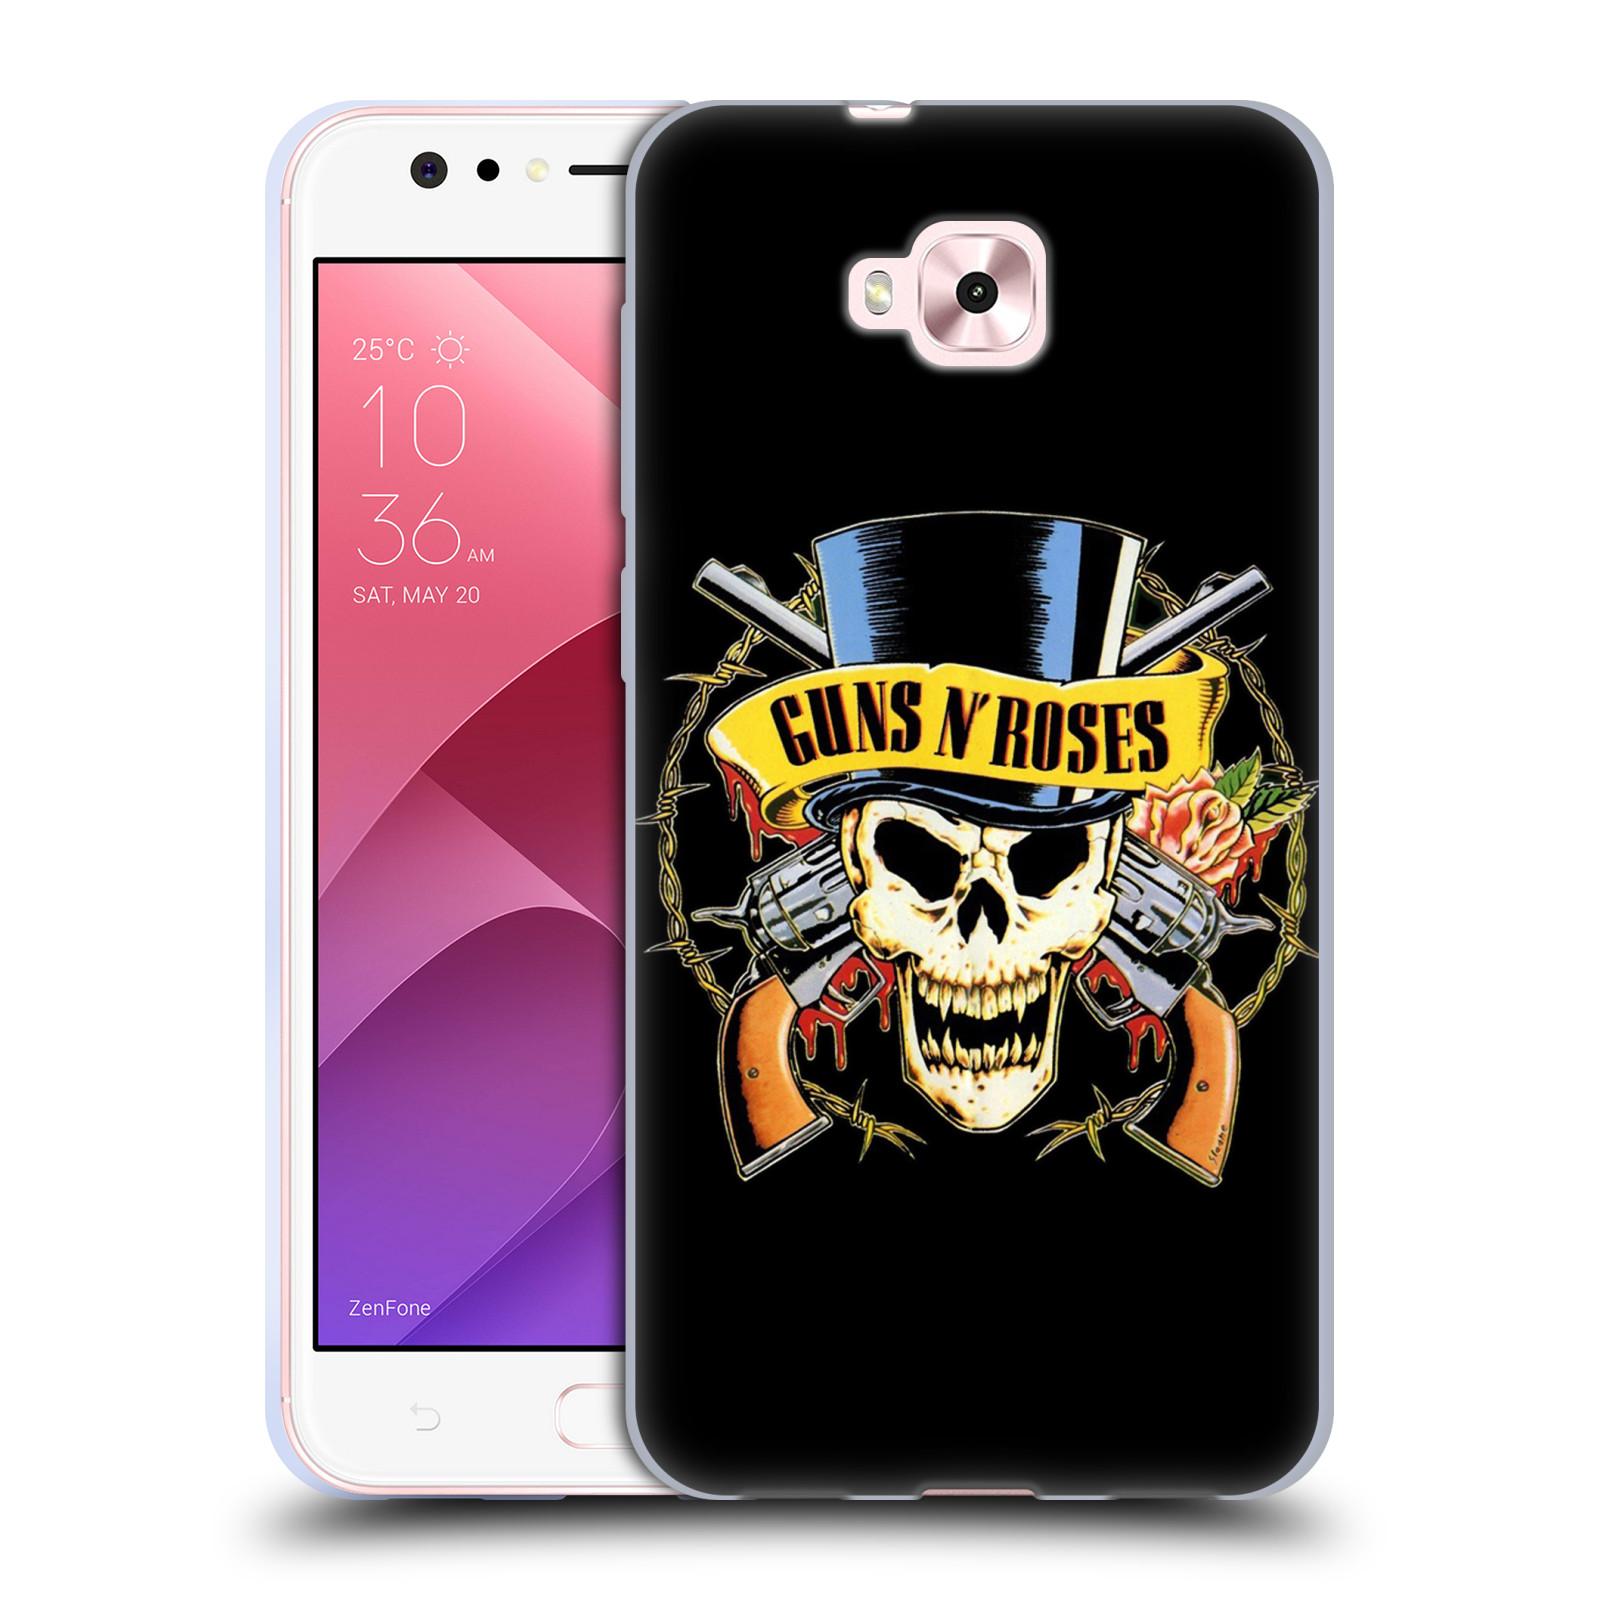 Silikonové pouzdro na mobil Asus Zenfone 4 Selfie ZD553KL - Head Case - Guns N' Roses - Lebka